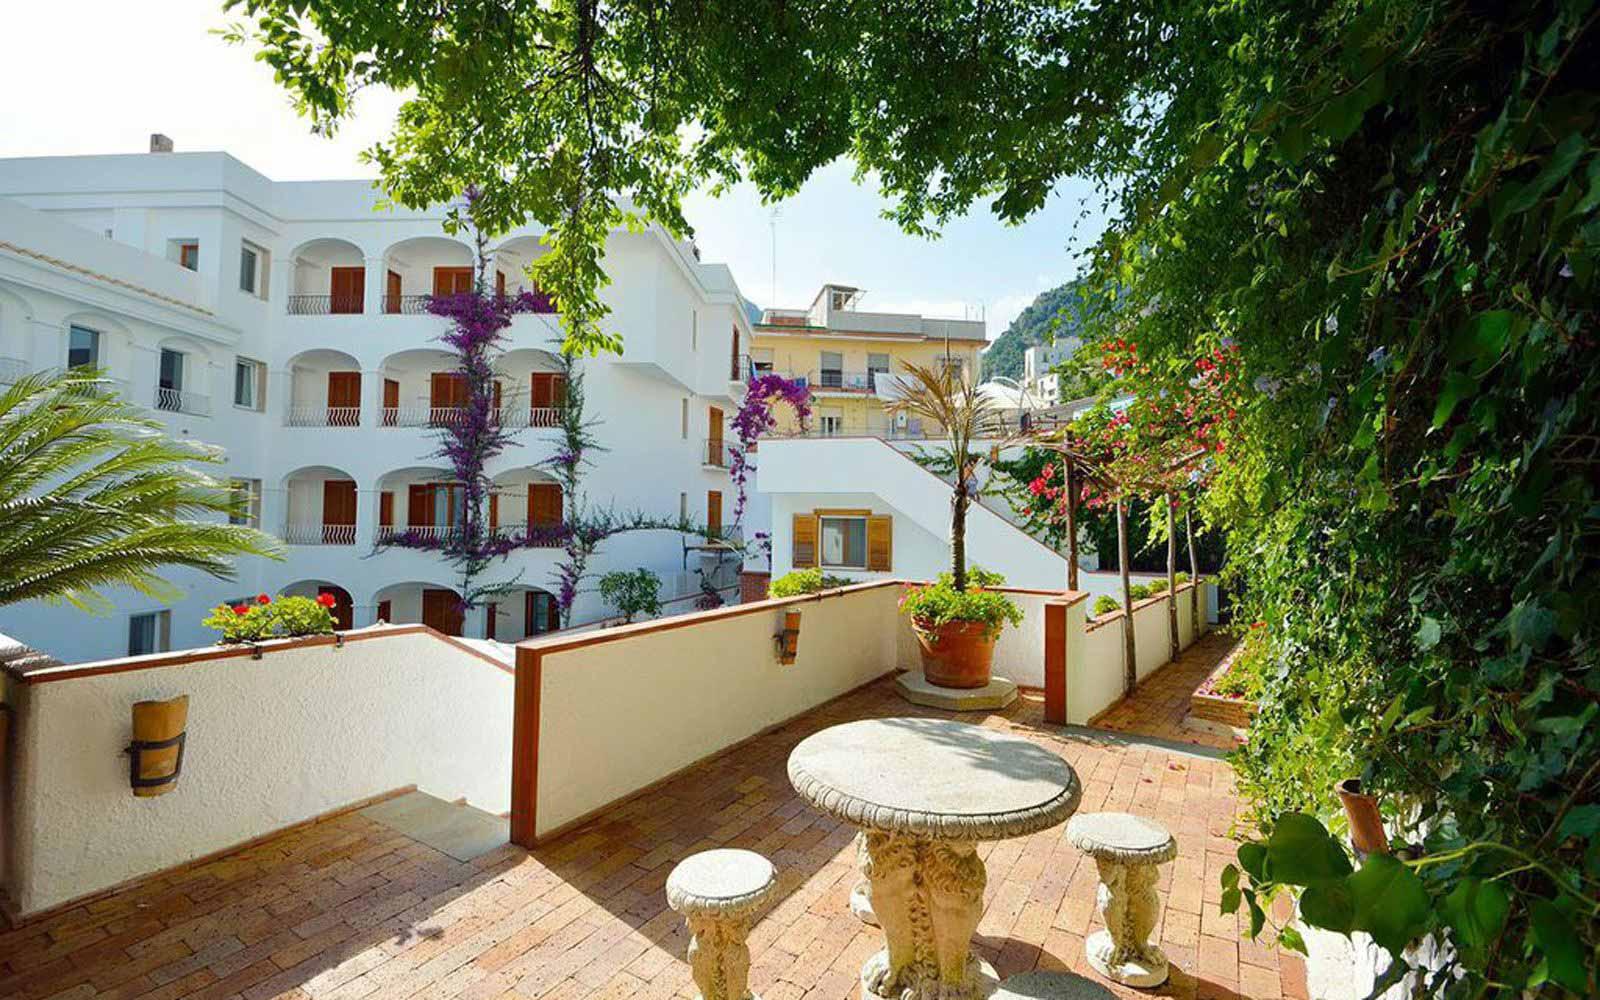 Hotel Villa Romana exterior